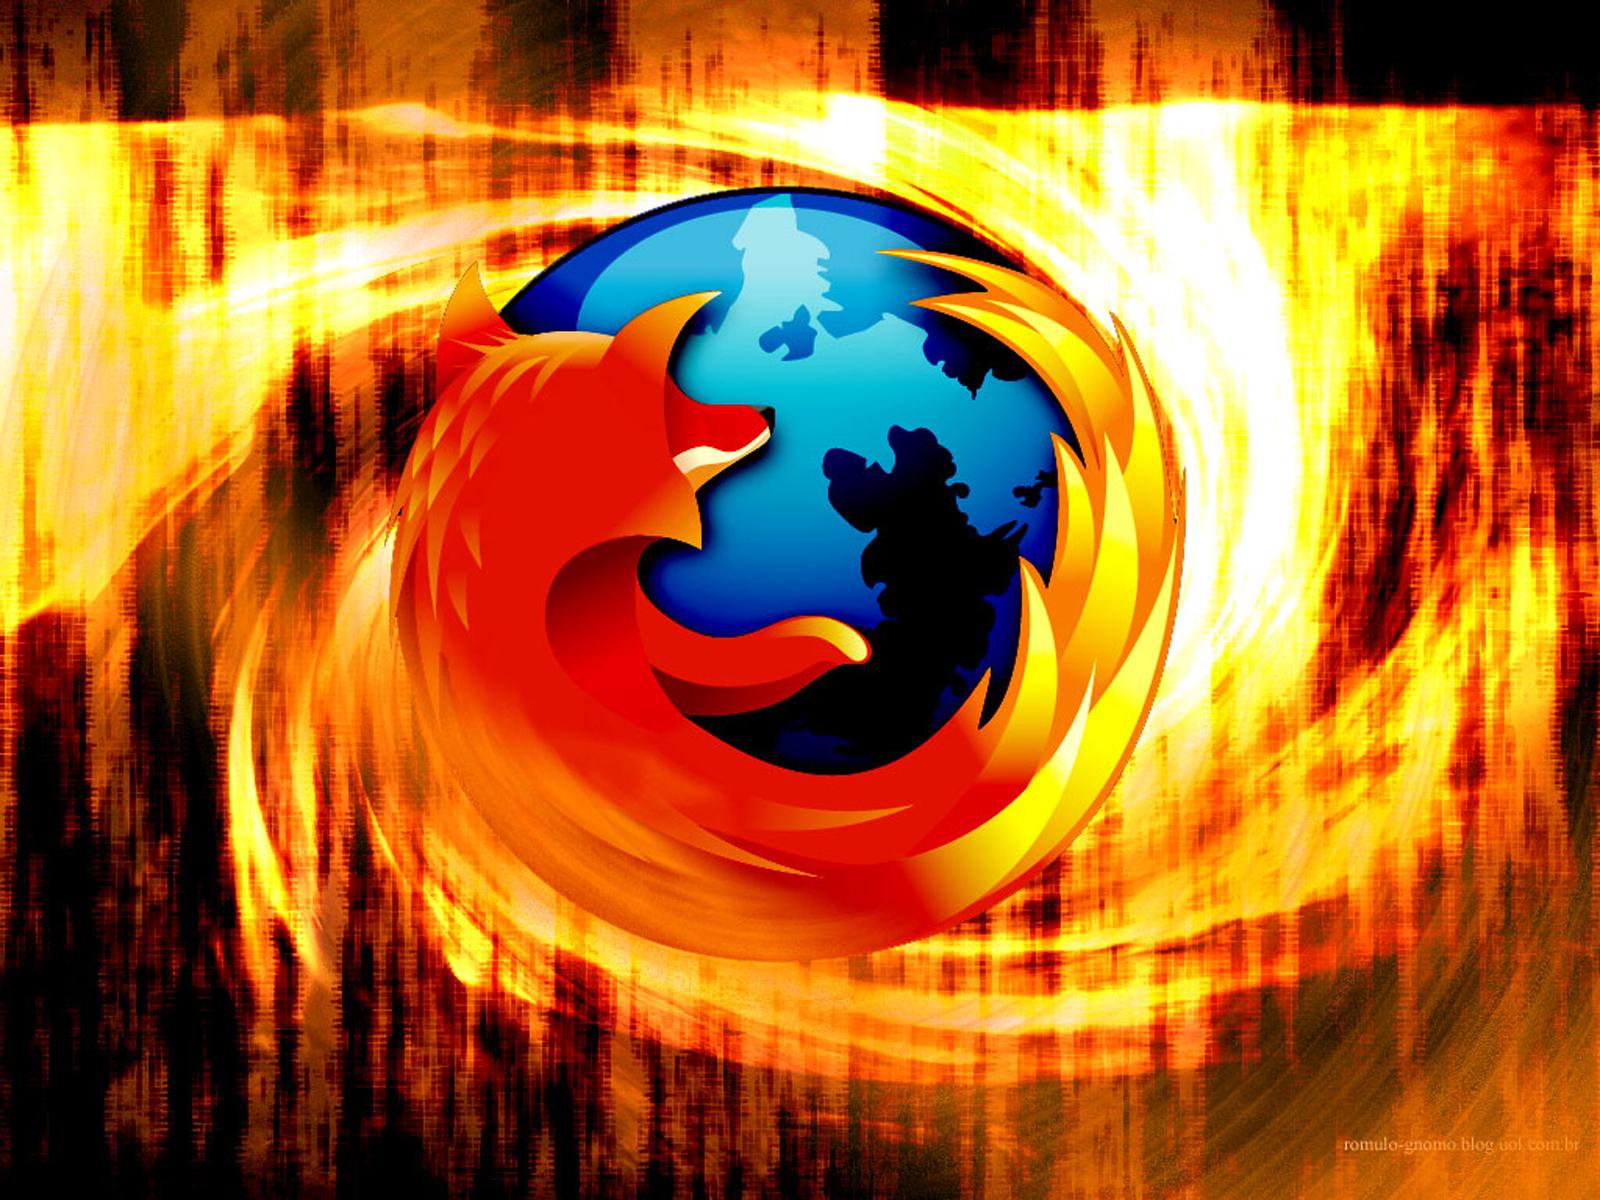 Firefox hd wallpapers mozilla background desktop wallpapers - How to change firefox background image ...